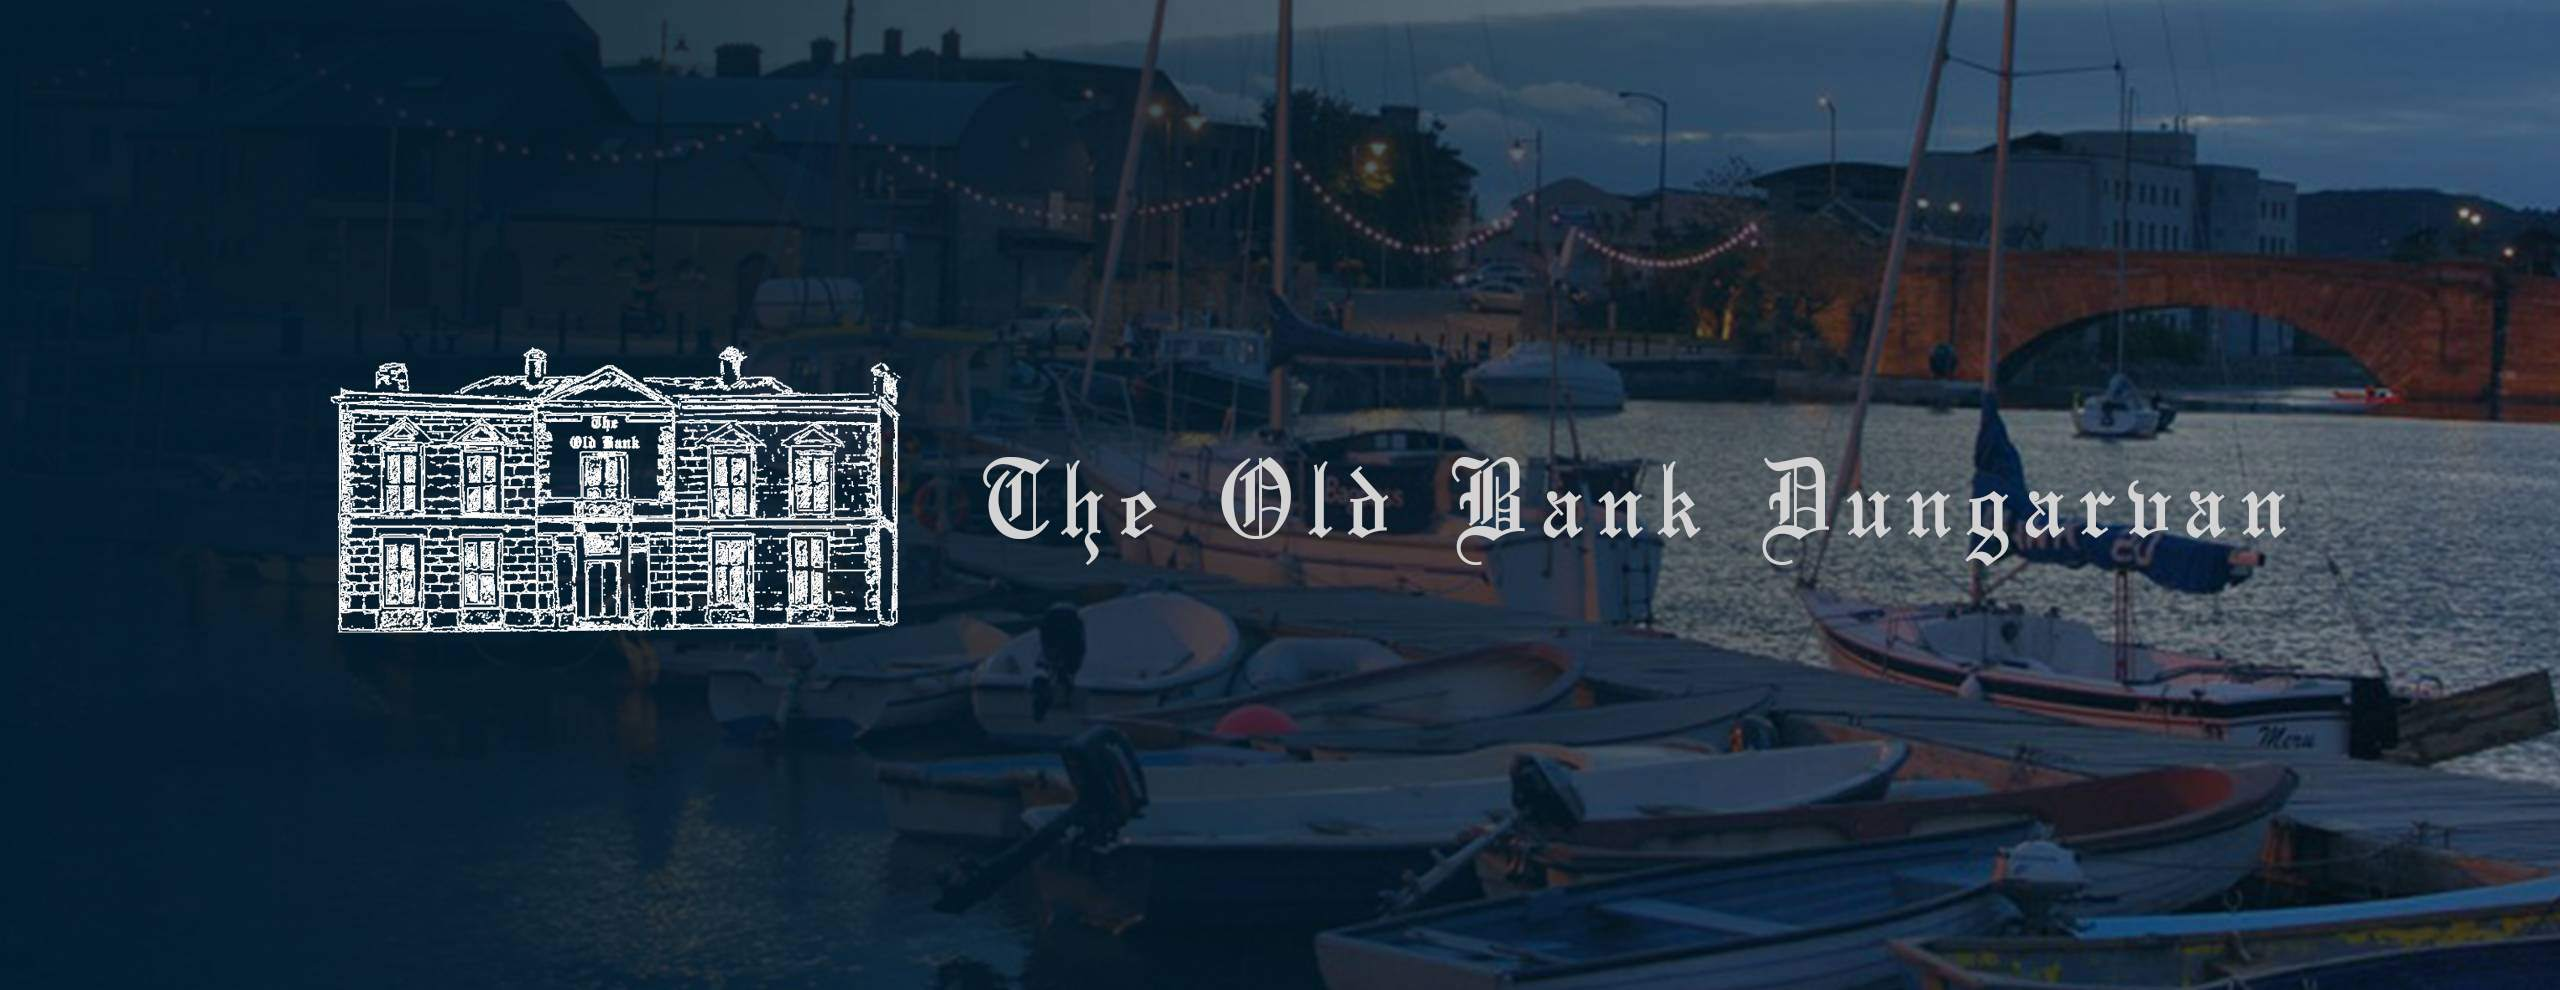 oldbank-9-scaled-1-1